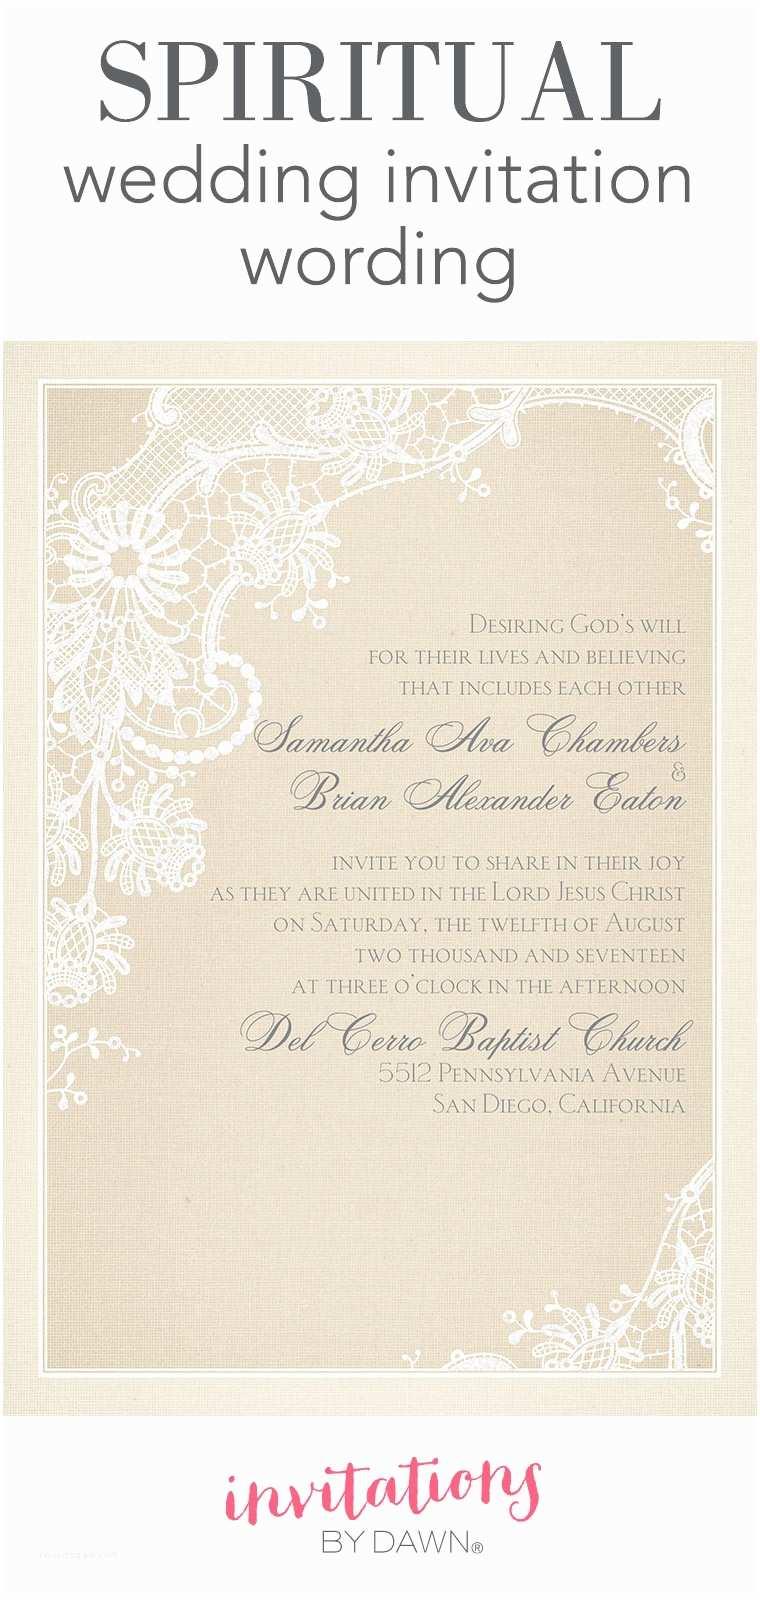 Wedding Invitation Poems Spiritual Wedding Invitation Wording